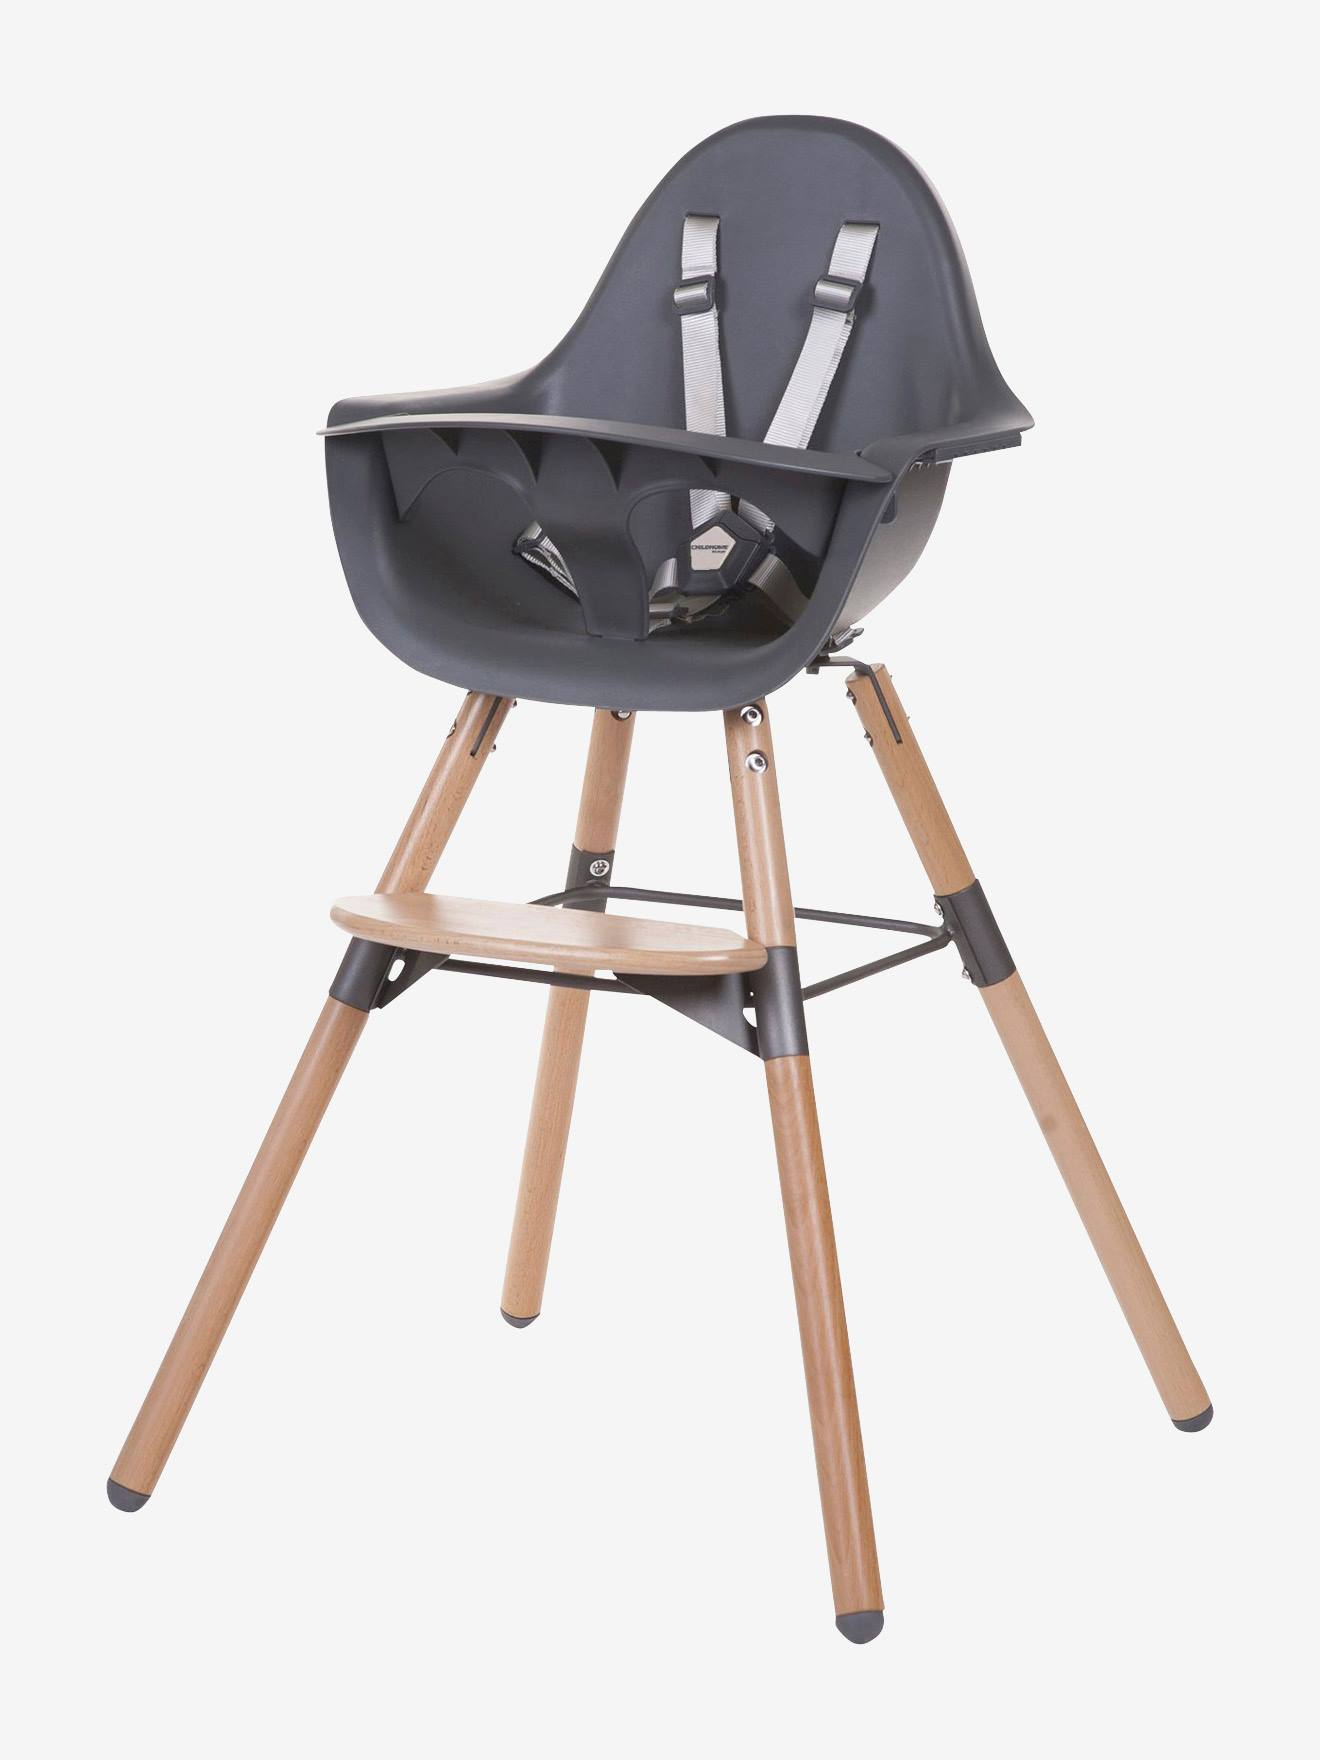 Chaise haute Evolu 2 + arceau CHILDHOME naturel anthracite